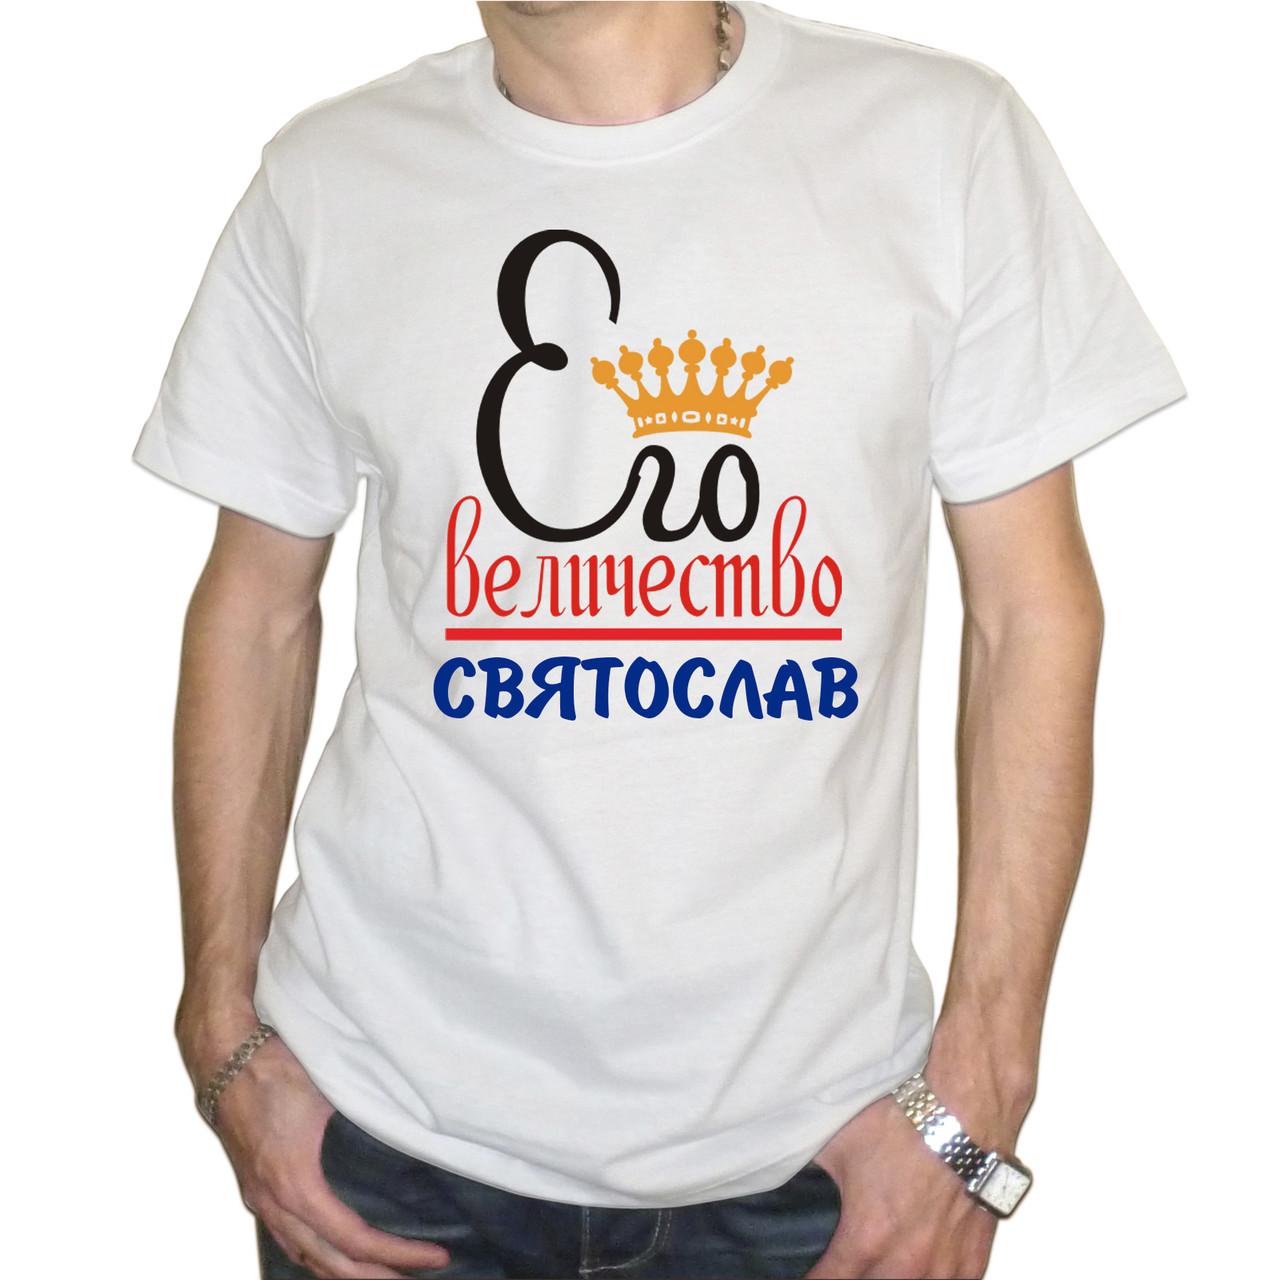 "Мужская футболка ""Его величество Святослав"""